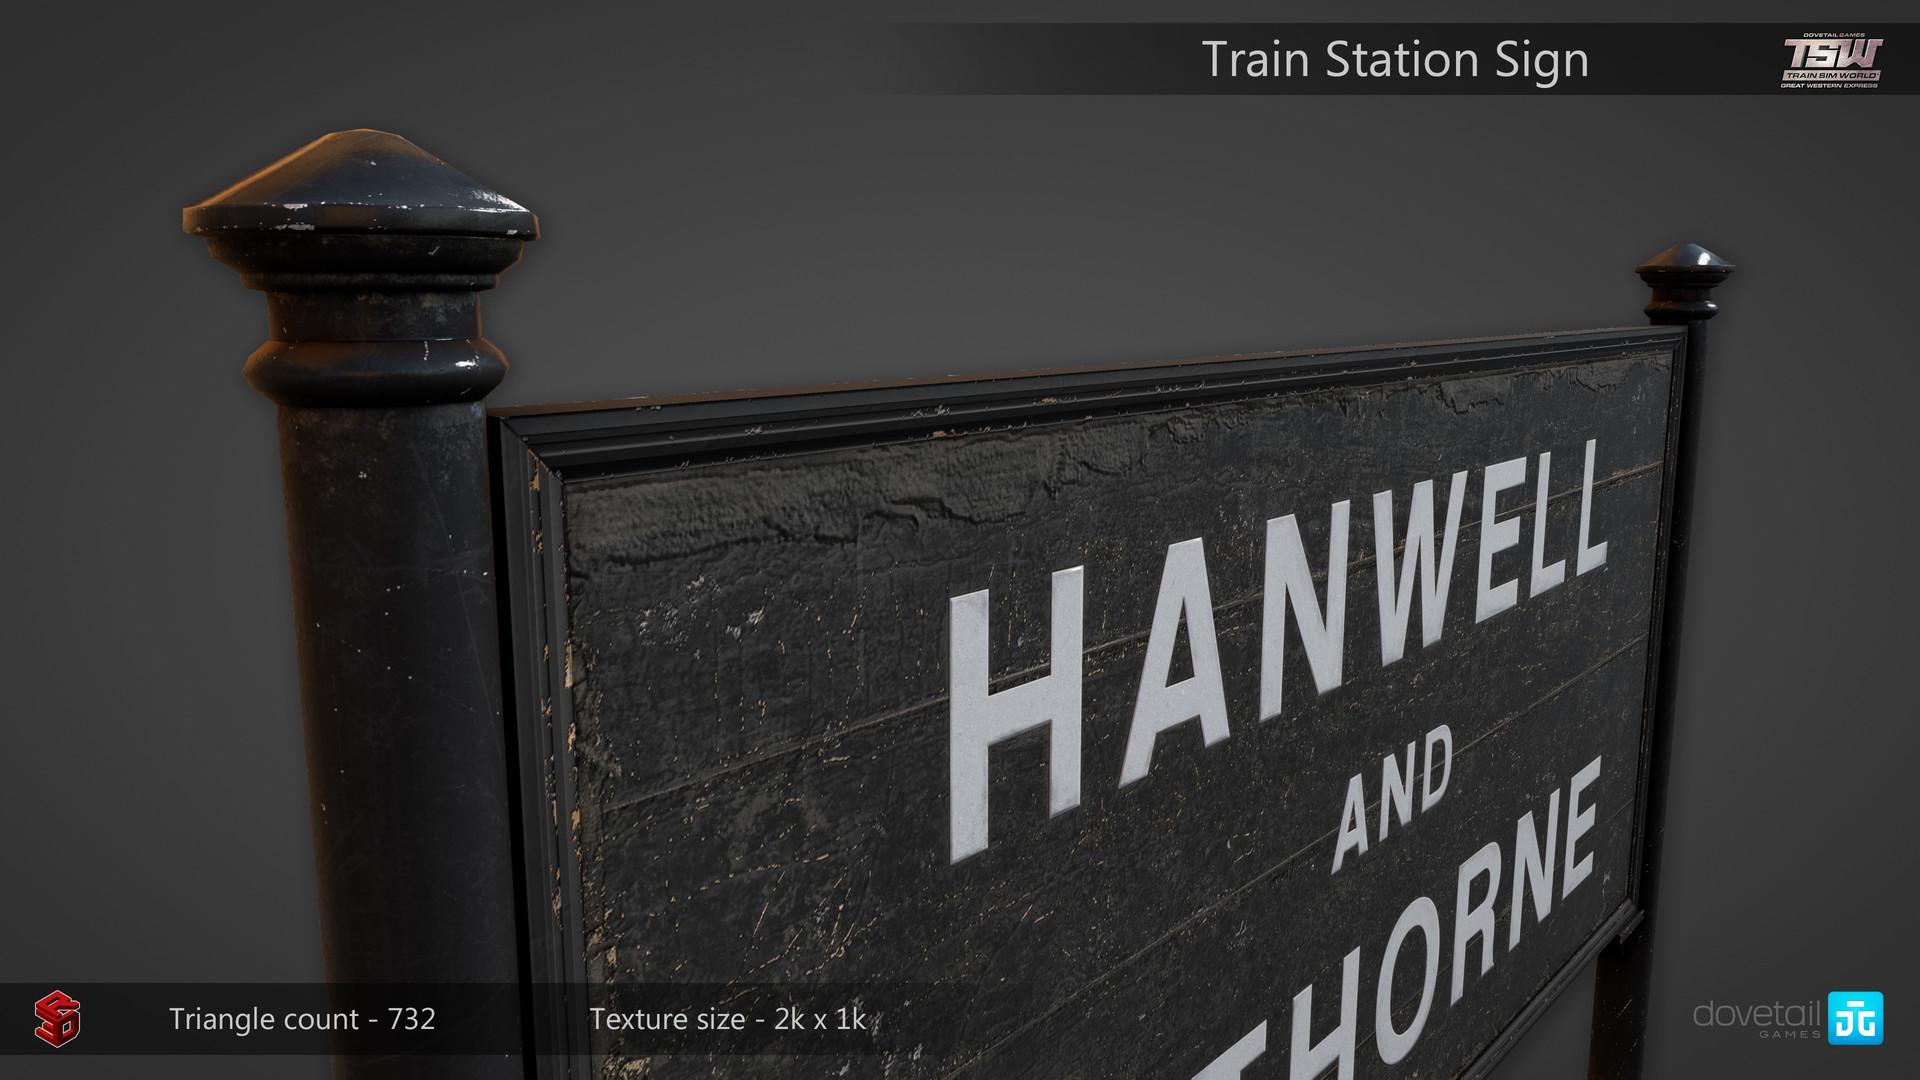 Ross mccafferty trainstationsign 03